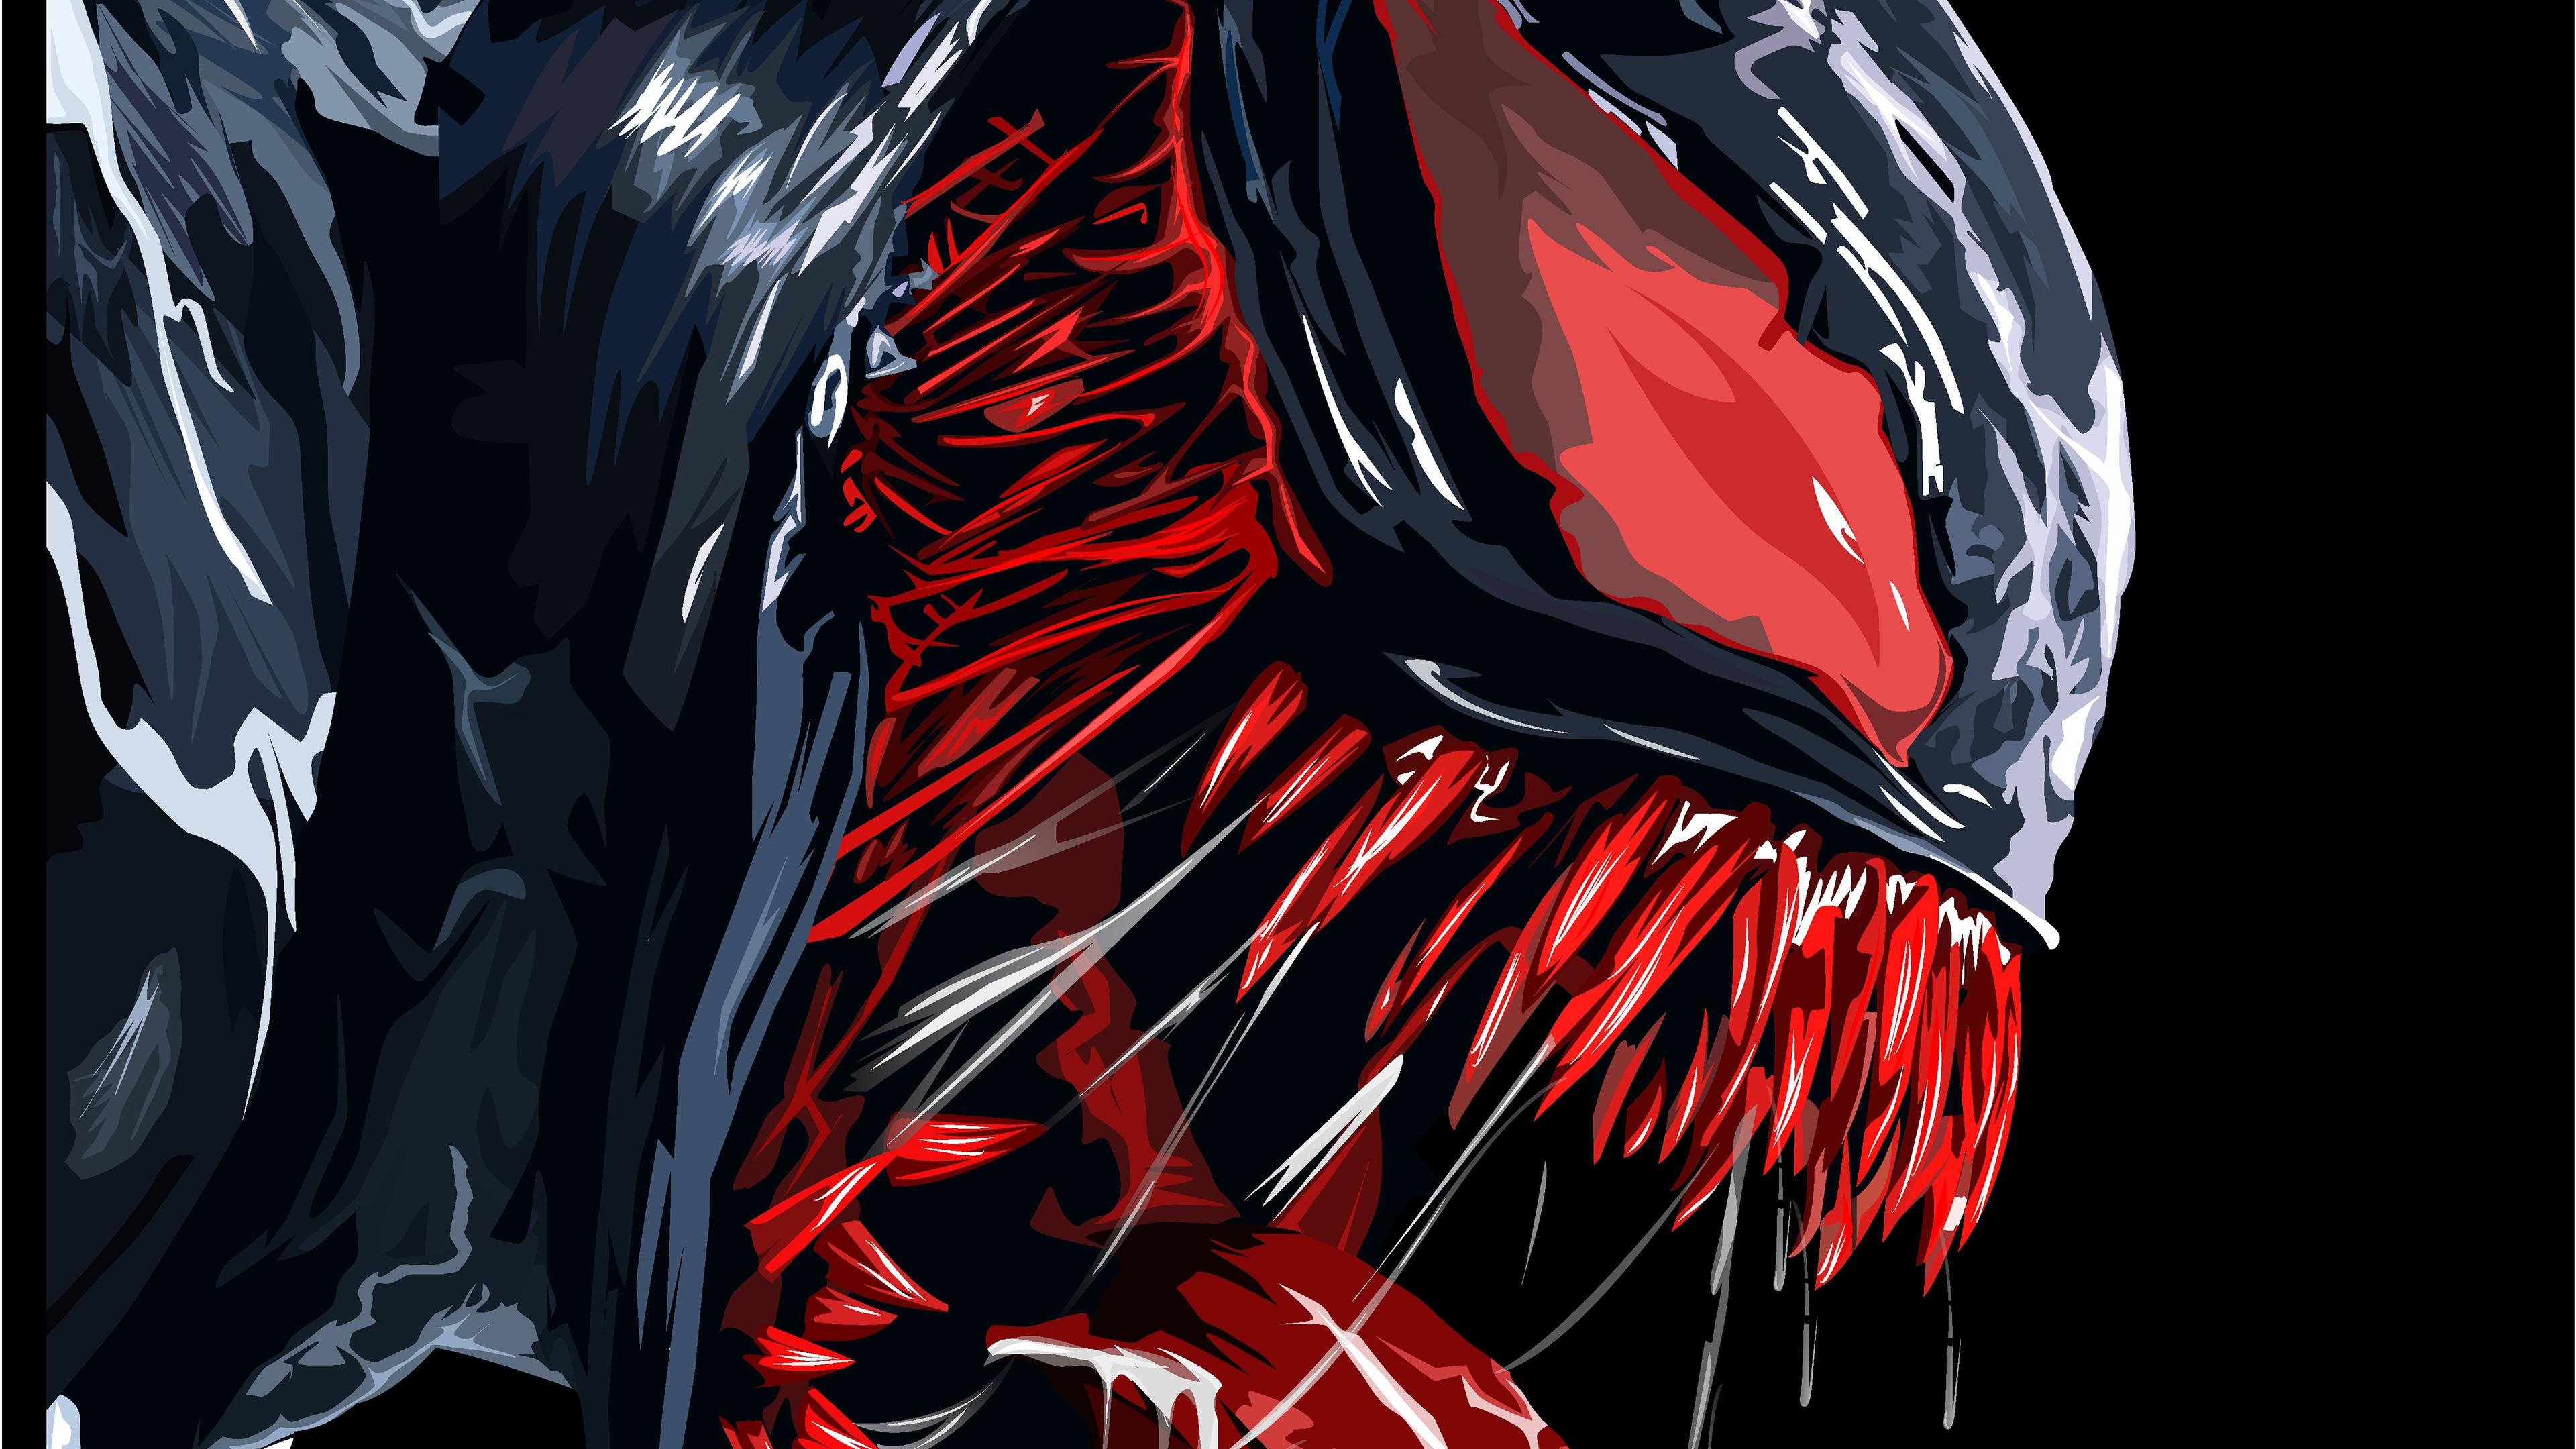 Red Venom Artwork 4k Hd Superheroes 4k Wallpapers Images